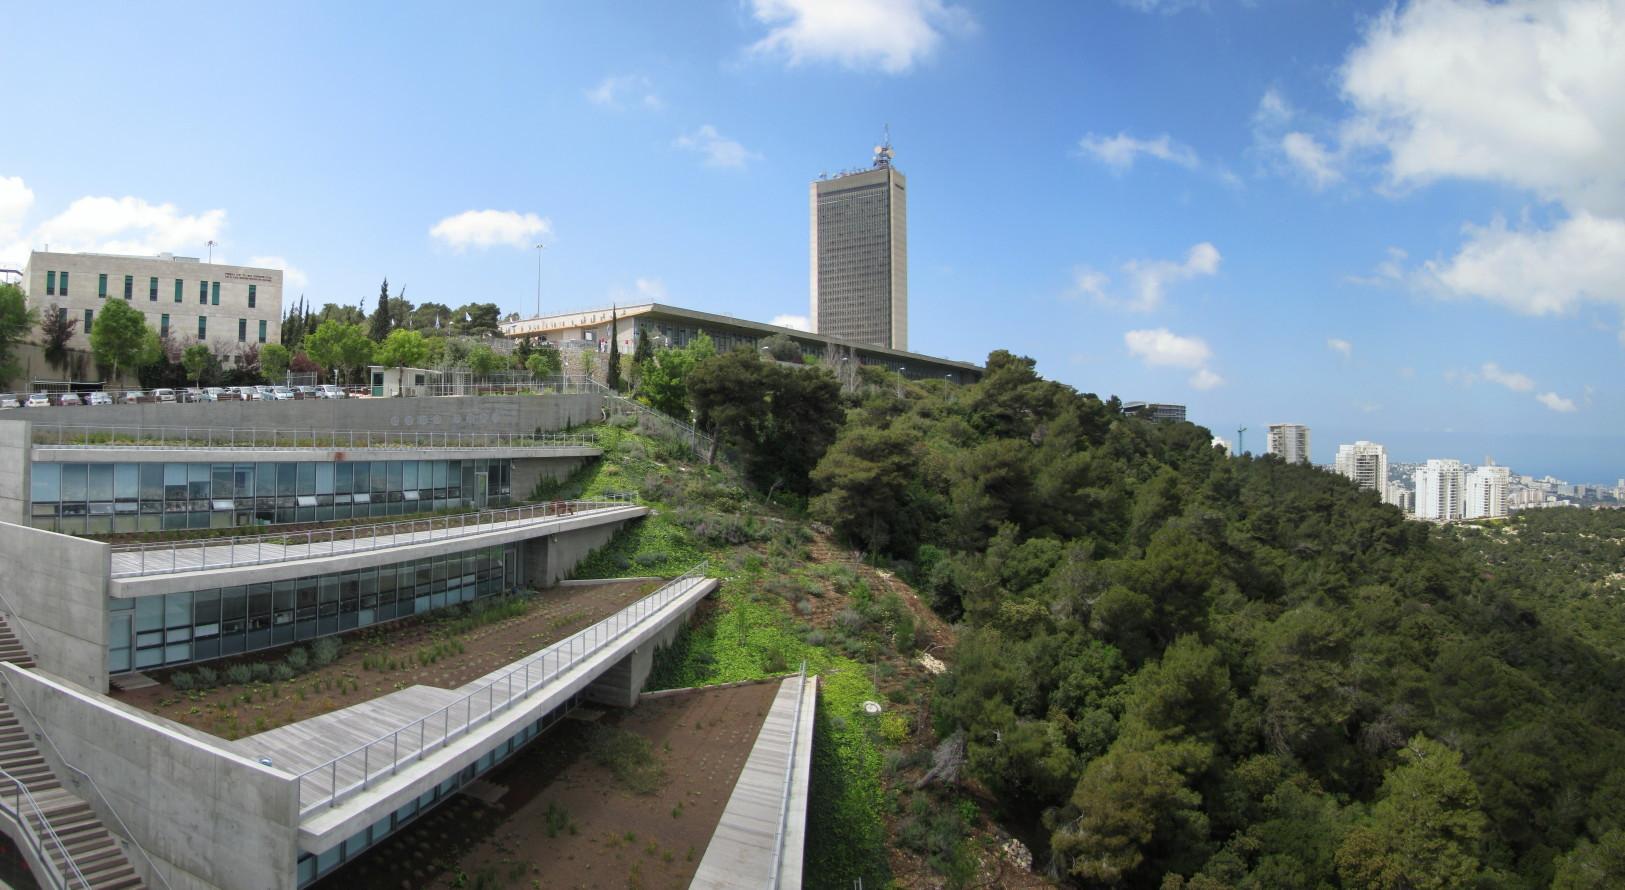 campus-view-mount carmel